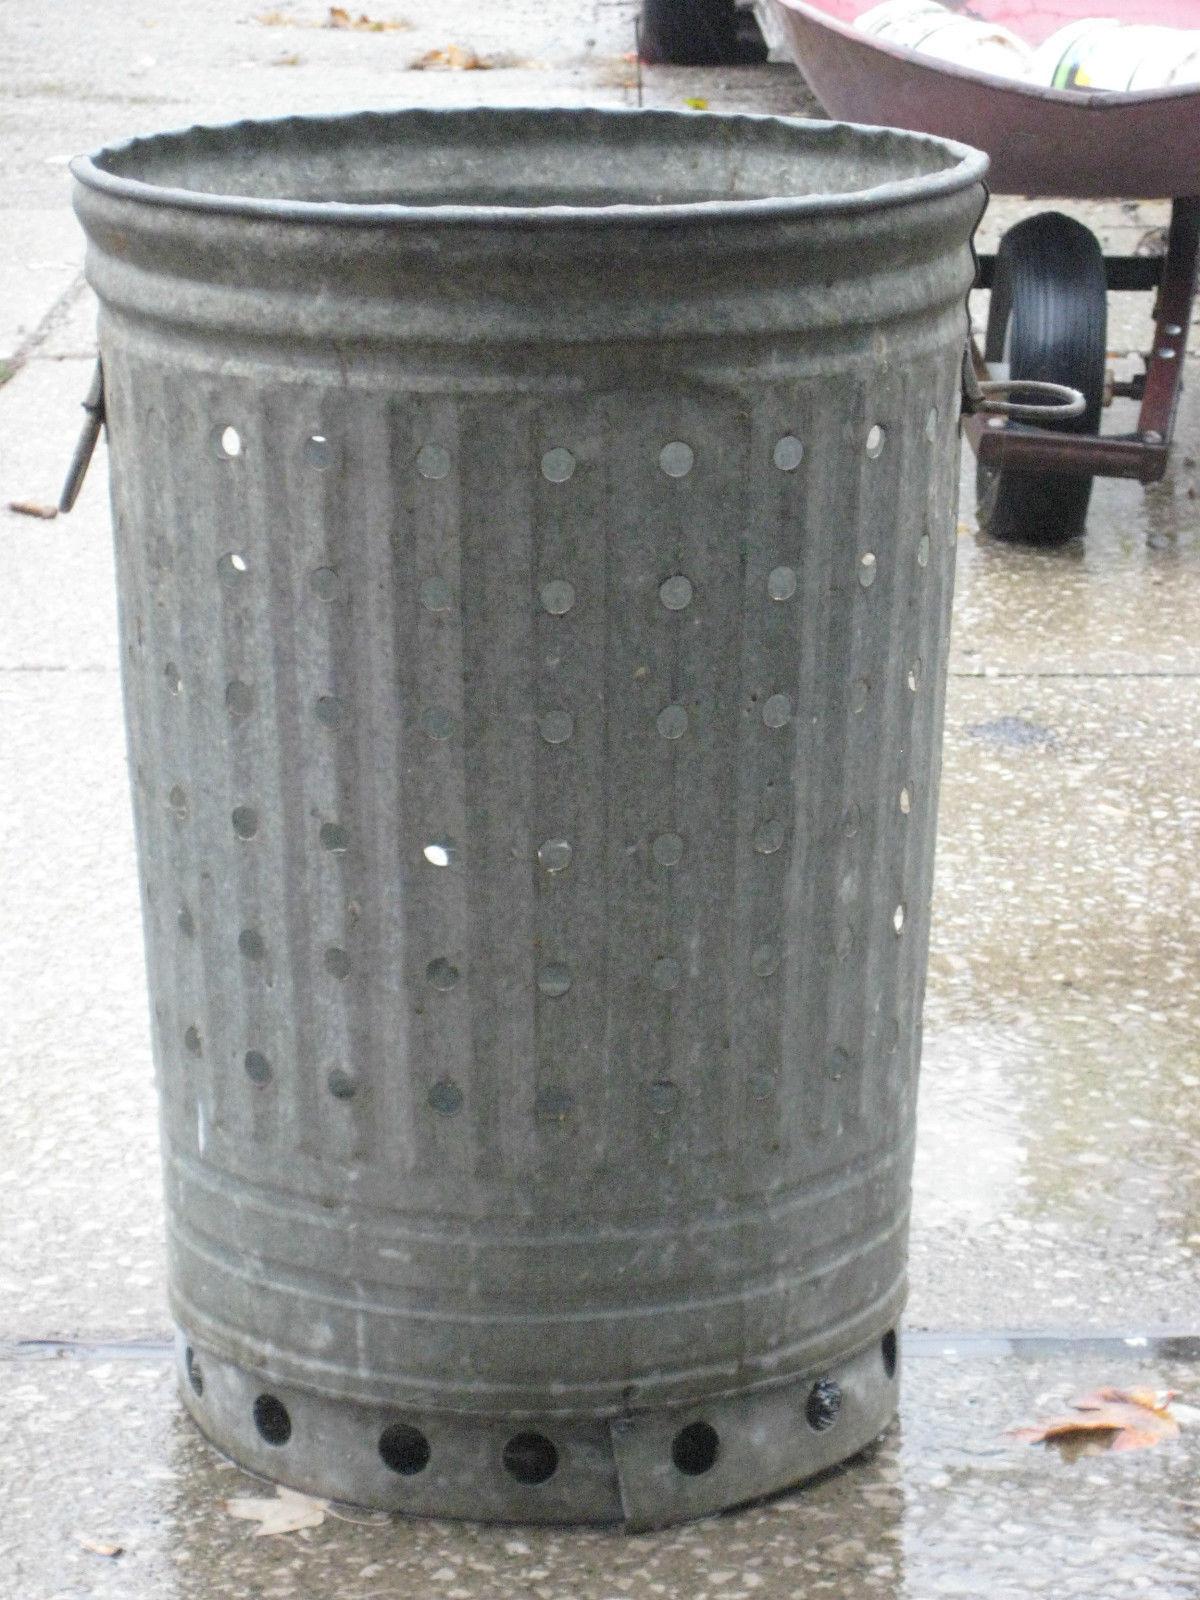 Aluminum Trash Cans : Vtg galvanized trash can w air holes industrial metal